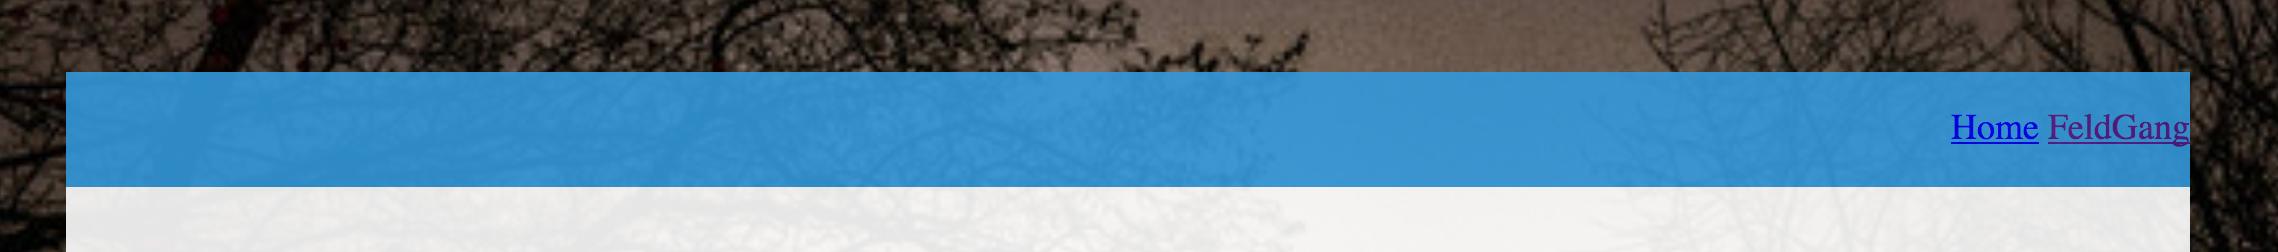 screenshot of updated nav